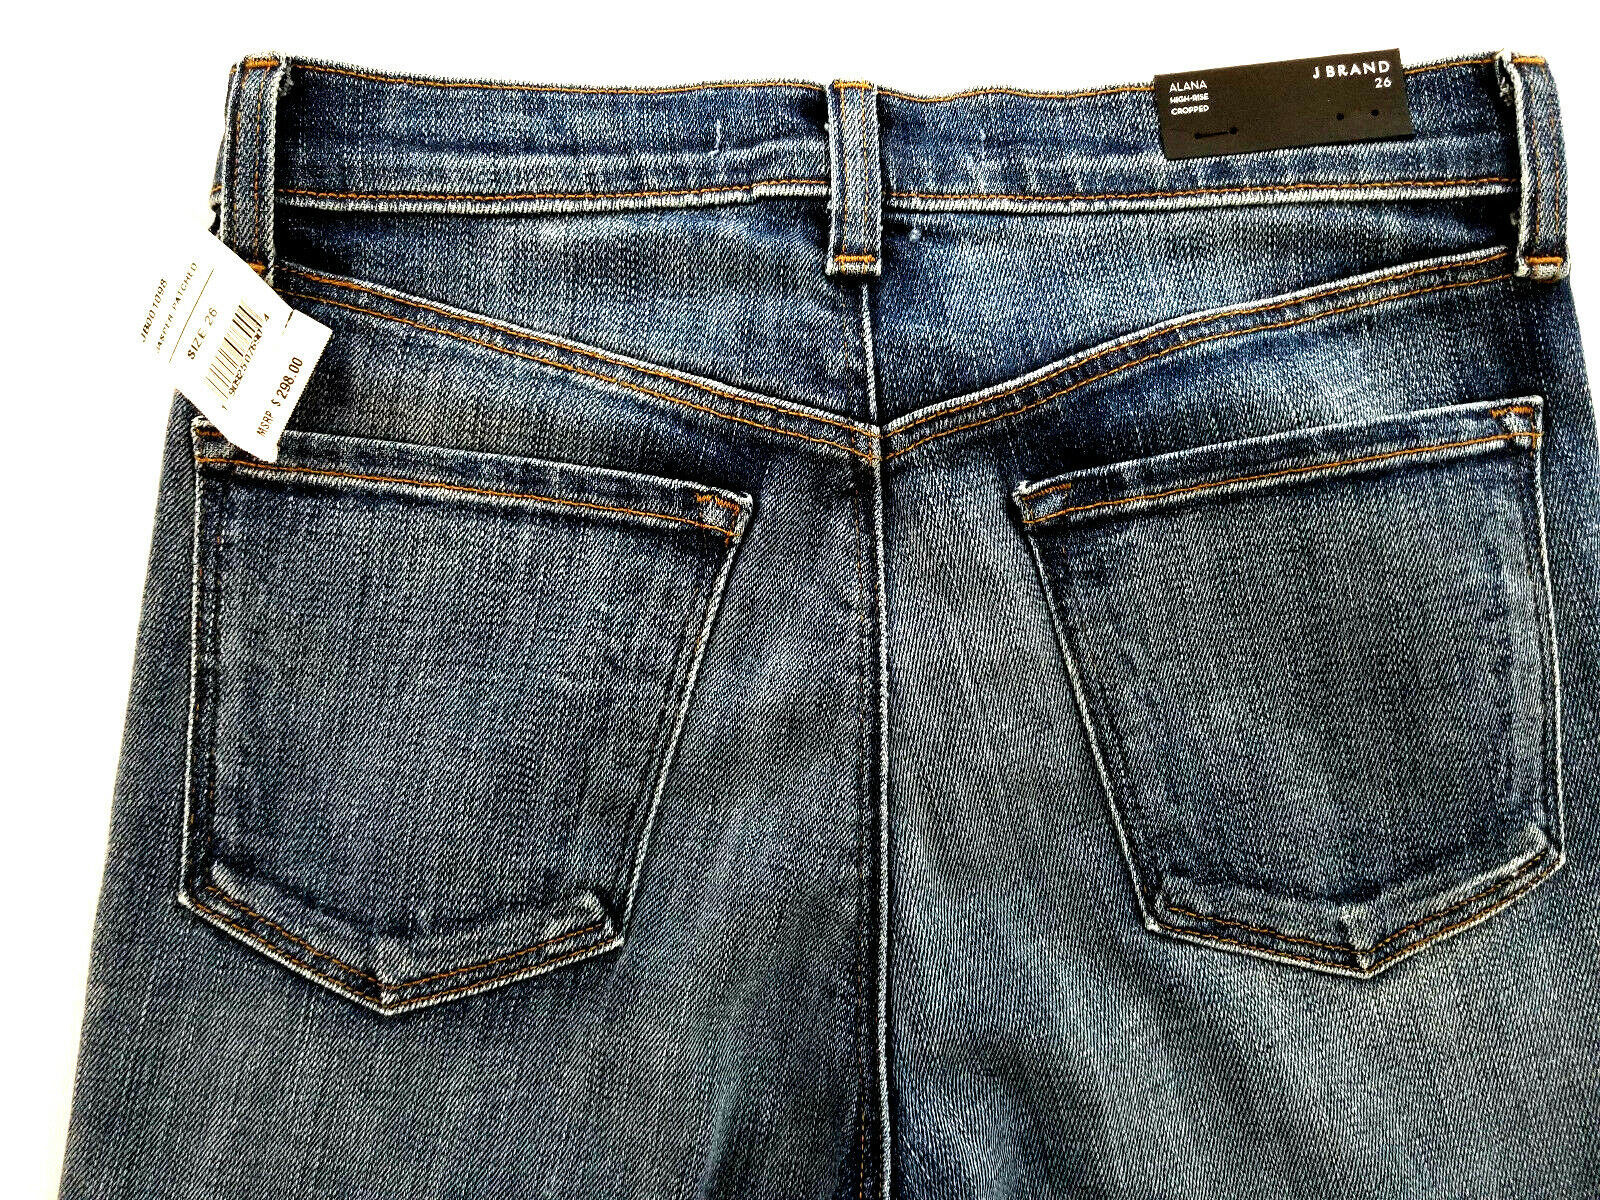 new J BRAND women jeans Jasper Patched JB001098 high rise crop 26 blue MSRP $298 image 9